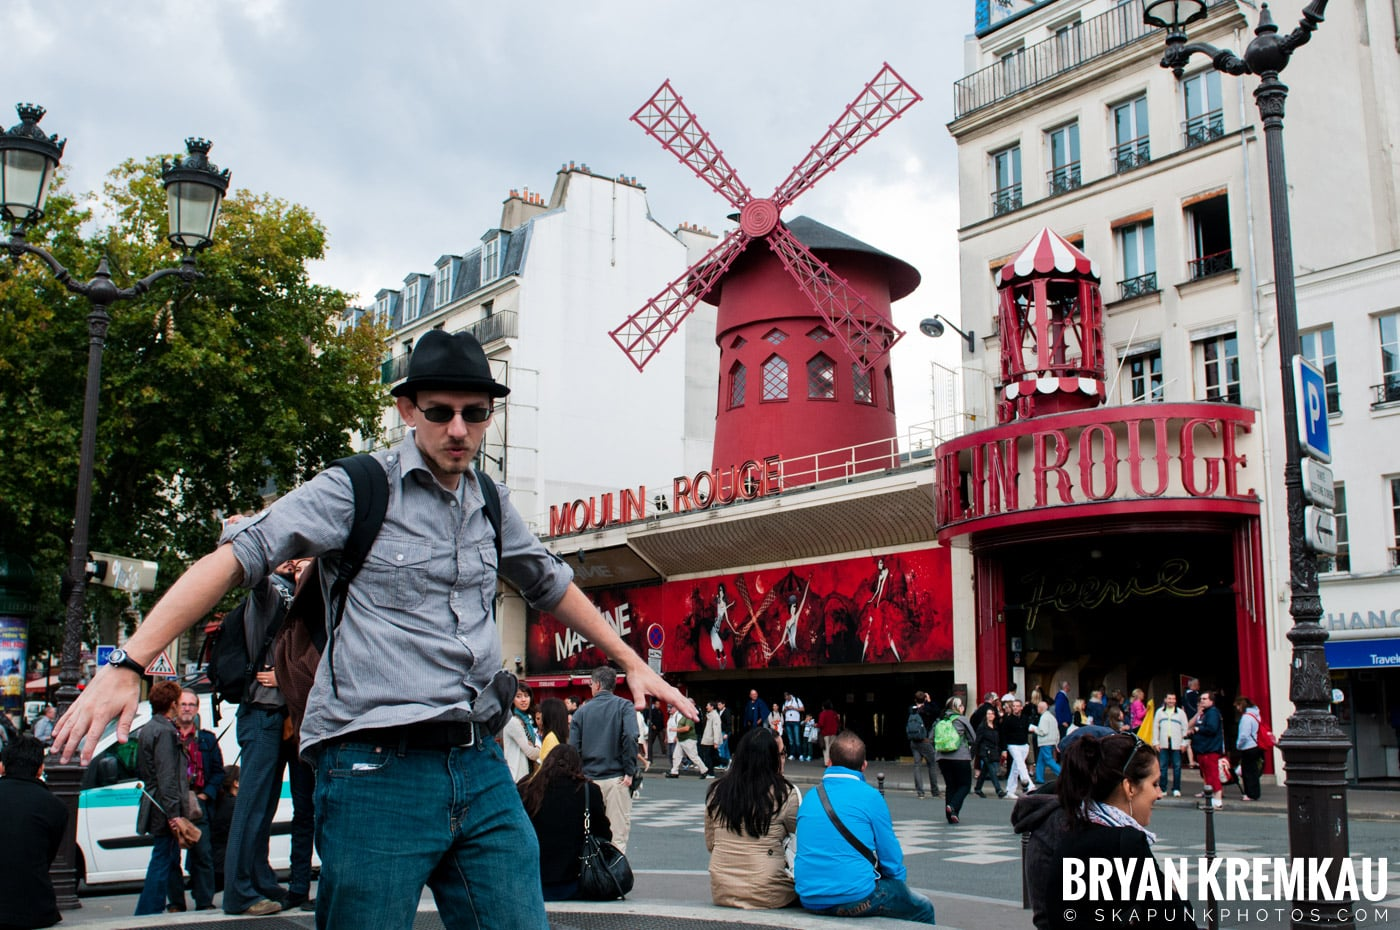 Paris, France Honeymoon - Day 6 - 7.23.11 (2)